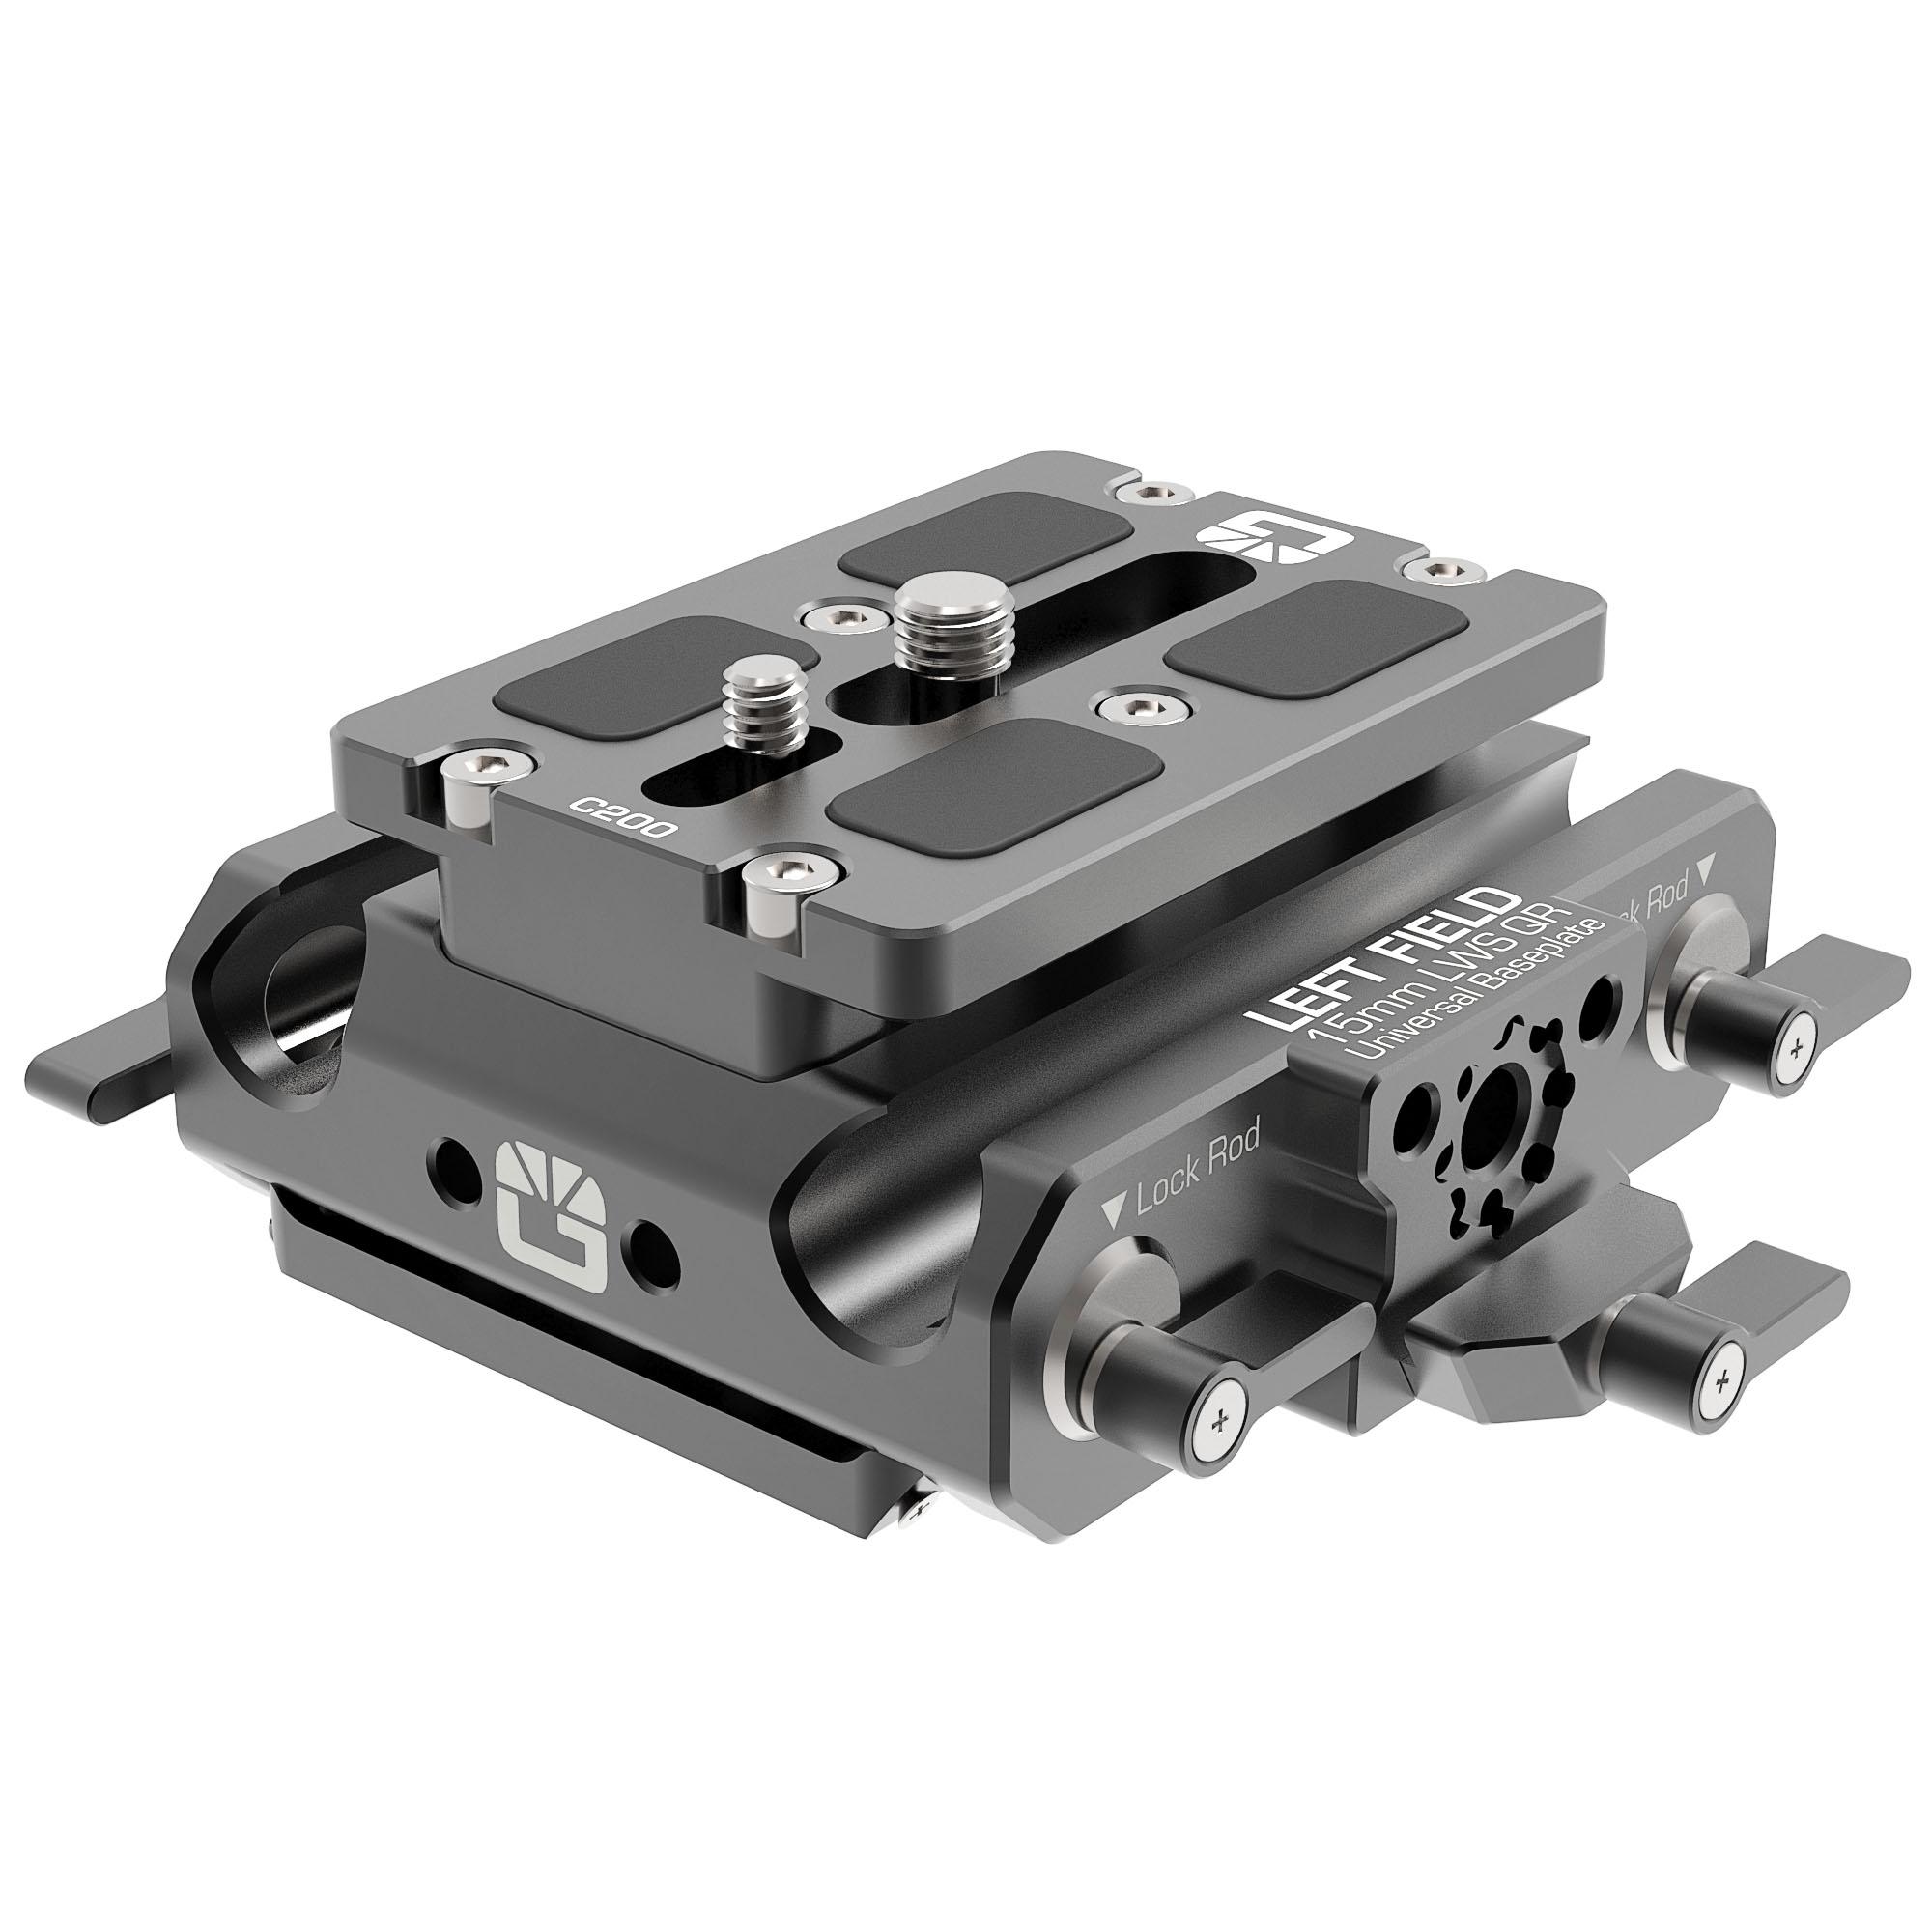 B4005.0001 Canon C200 LWS sliding Baseplate 1 1